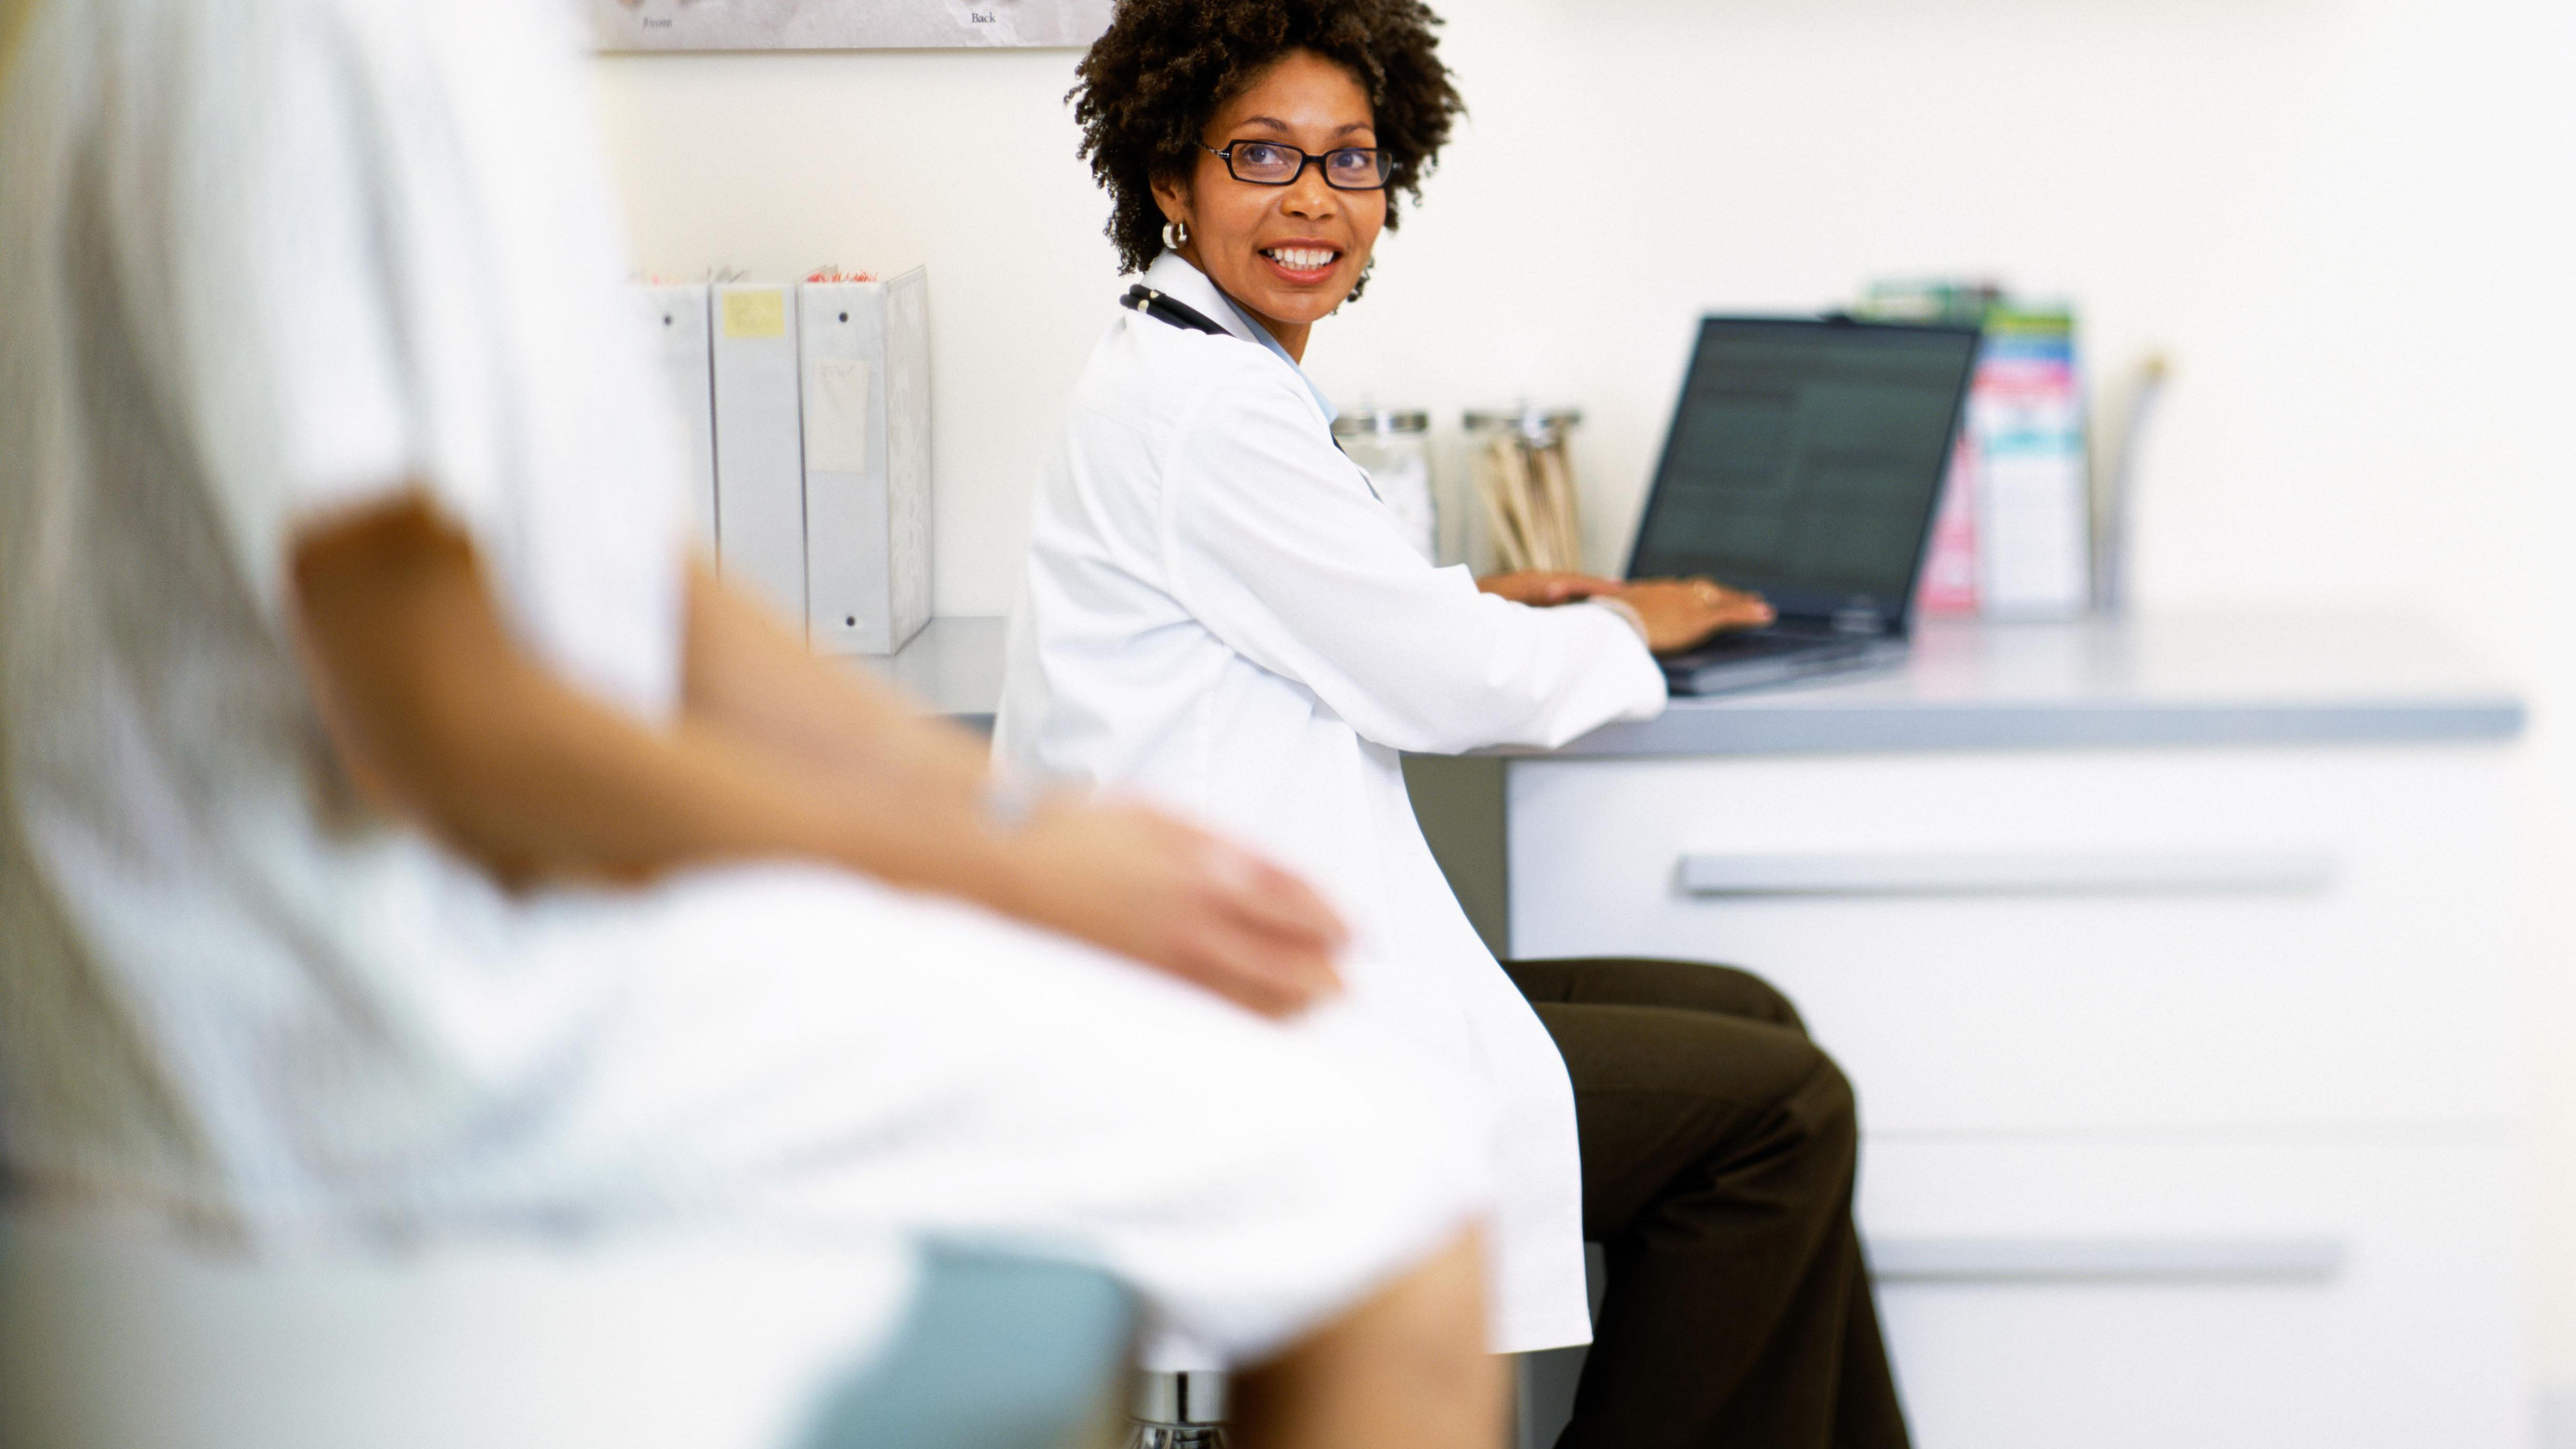 IUI Treatment: Procedure, Costs, Success Rates